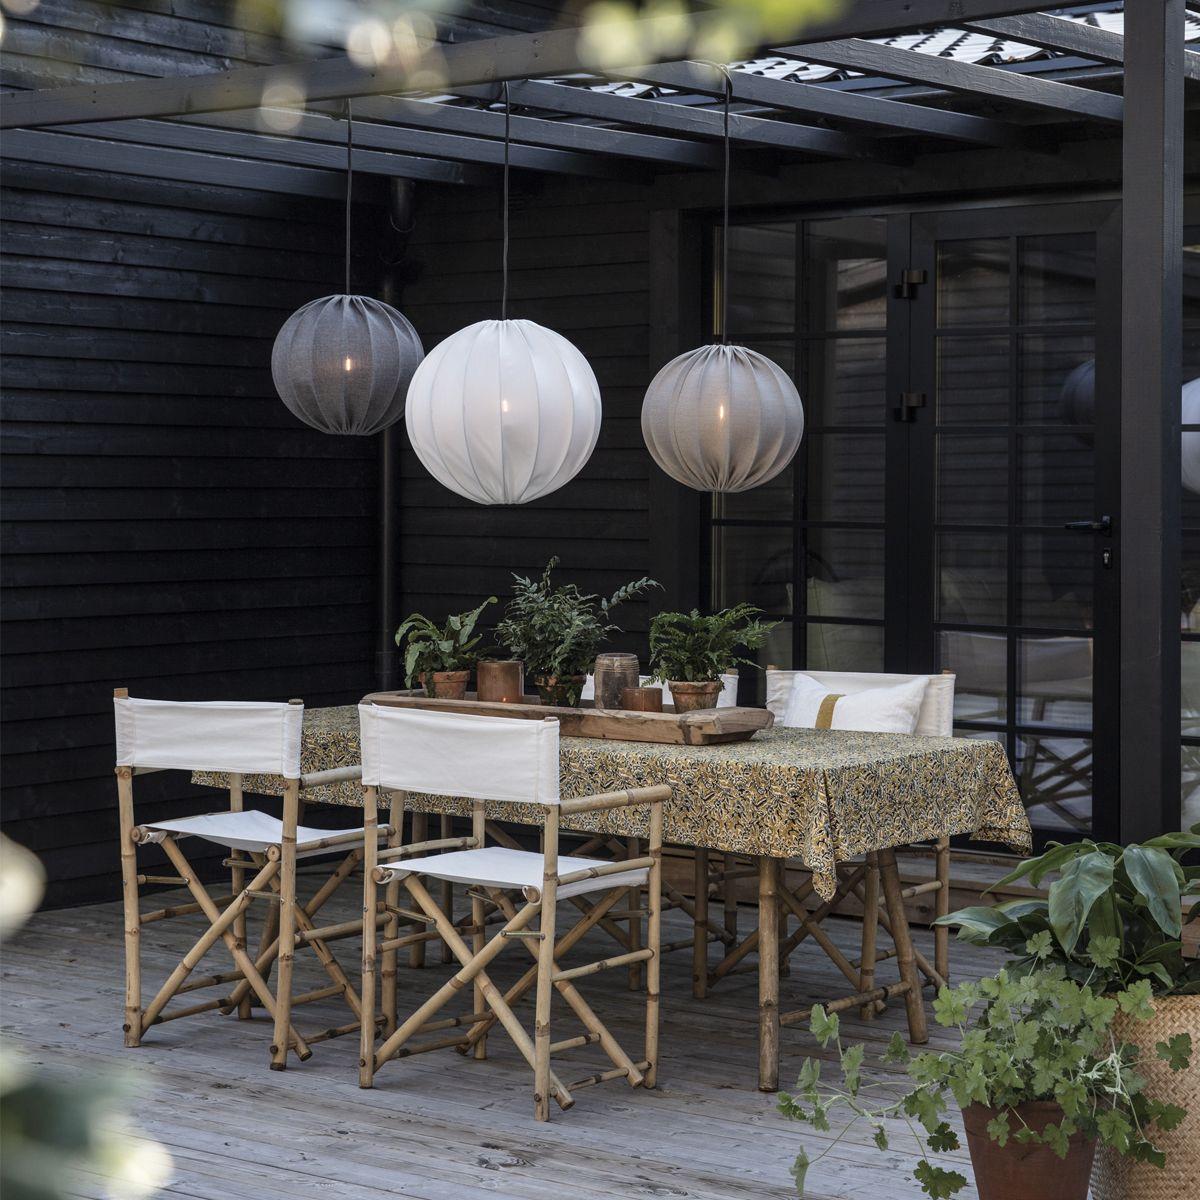 Inspiration PR Home | Uteplats, Taklampa, Utomhusbelysning